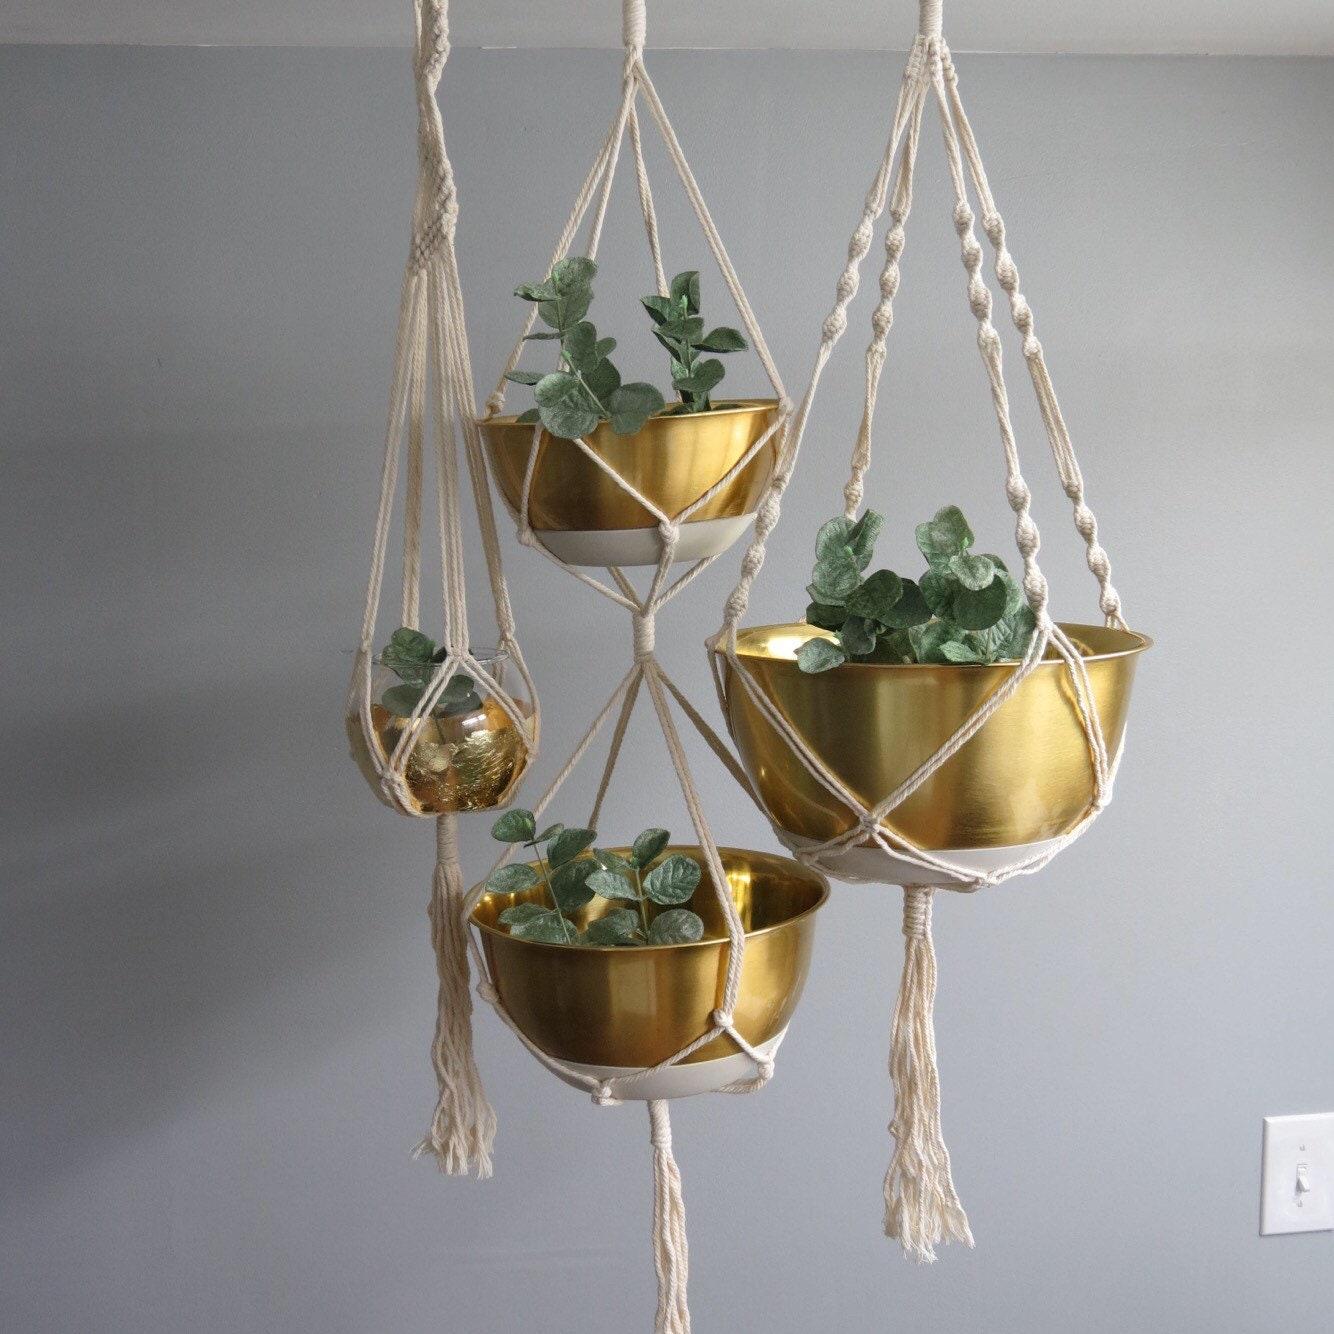 boho suspendre jardini res macram corde suspension etsy. Black Bedroom Furniture Sets. Home Design Ideas